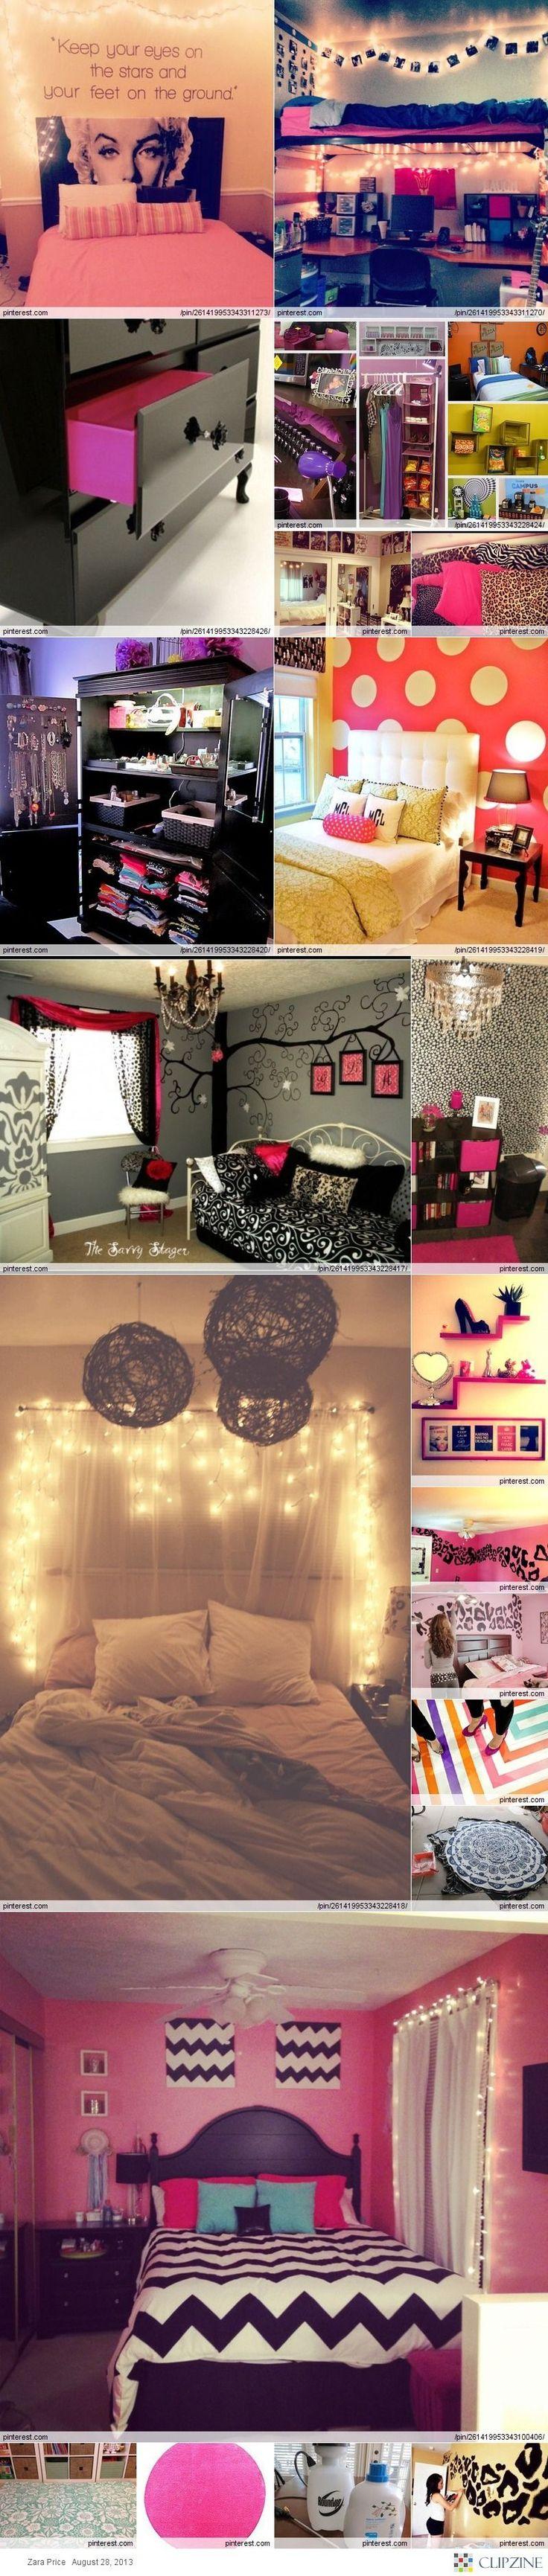 My new room ideas